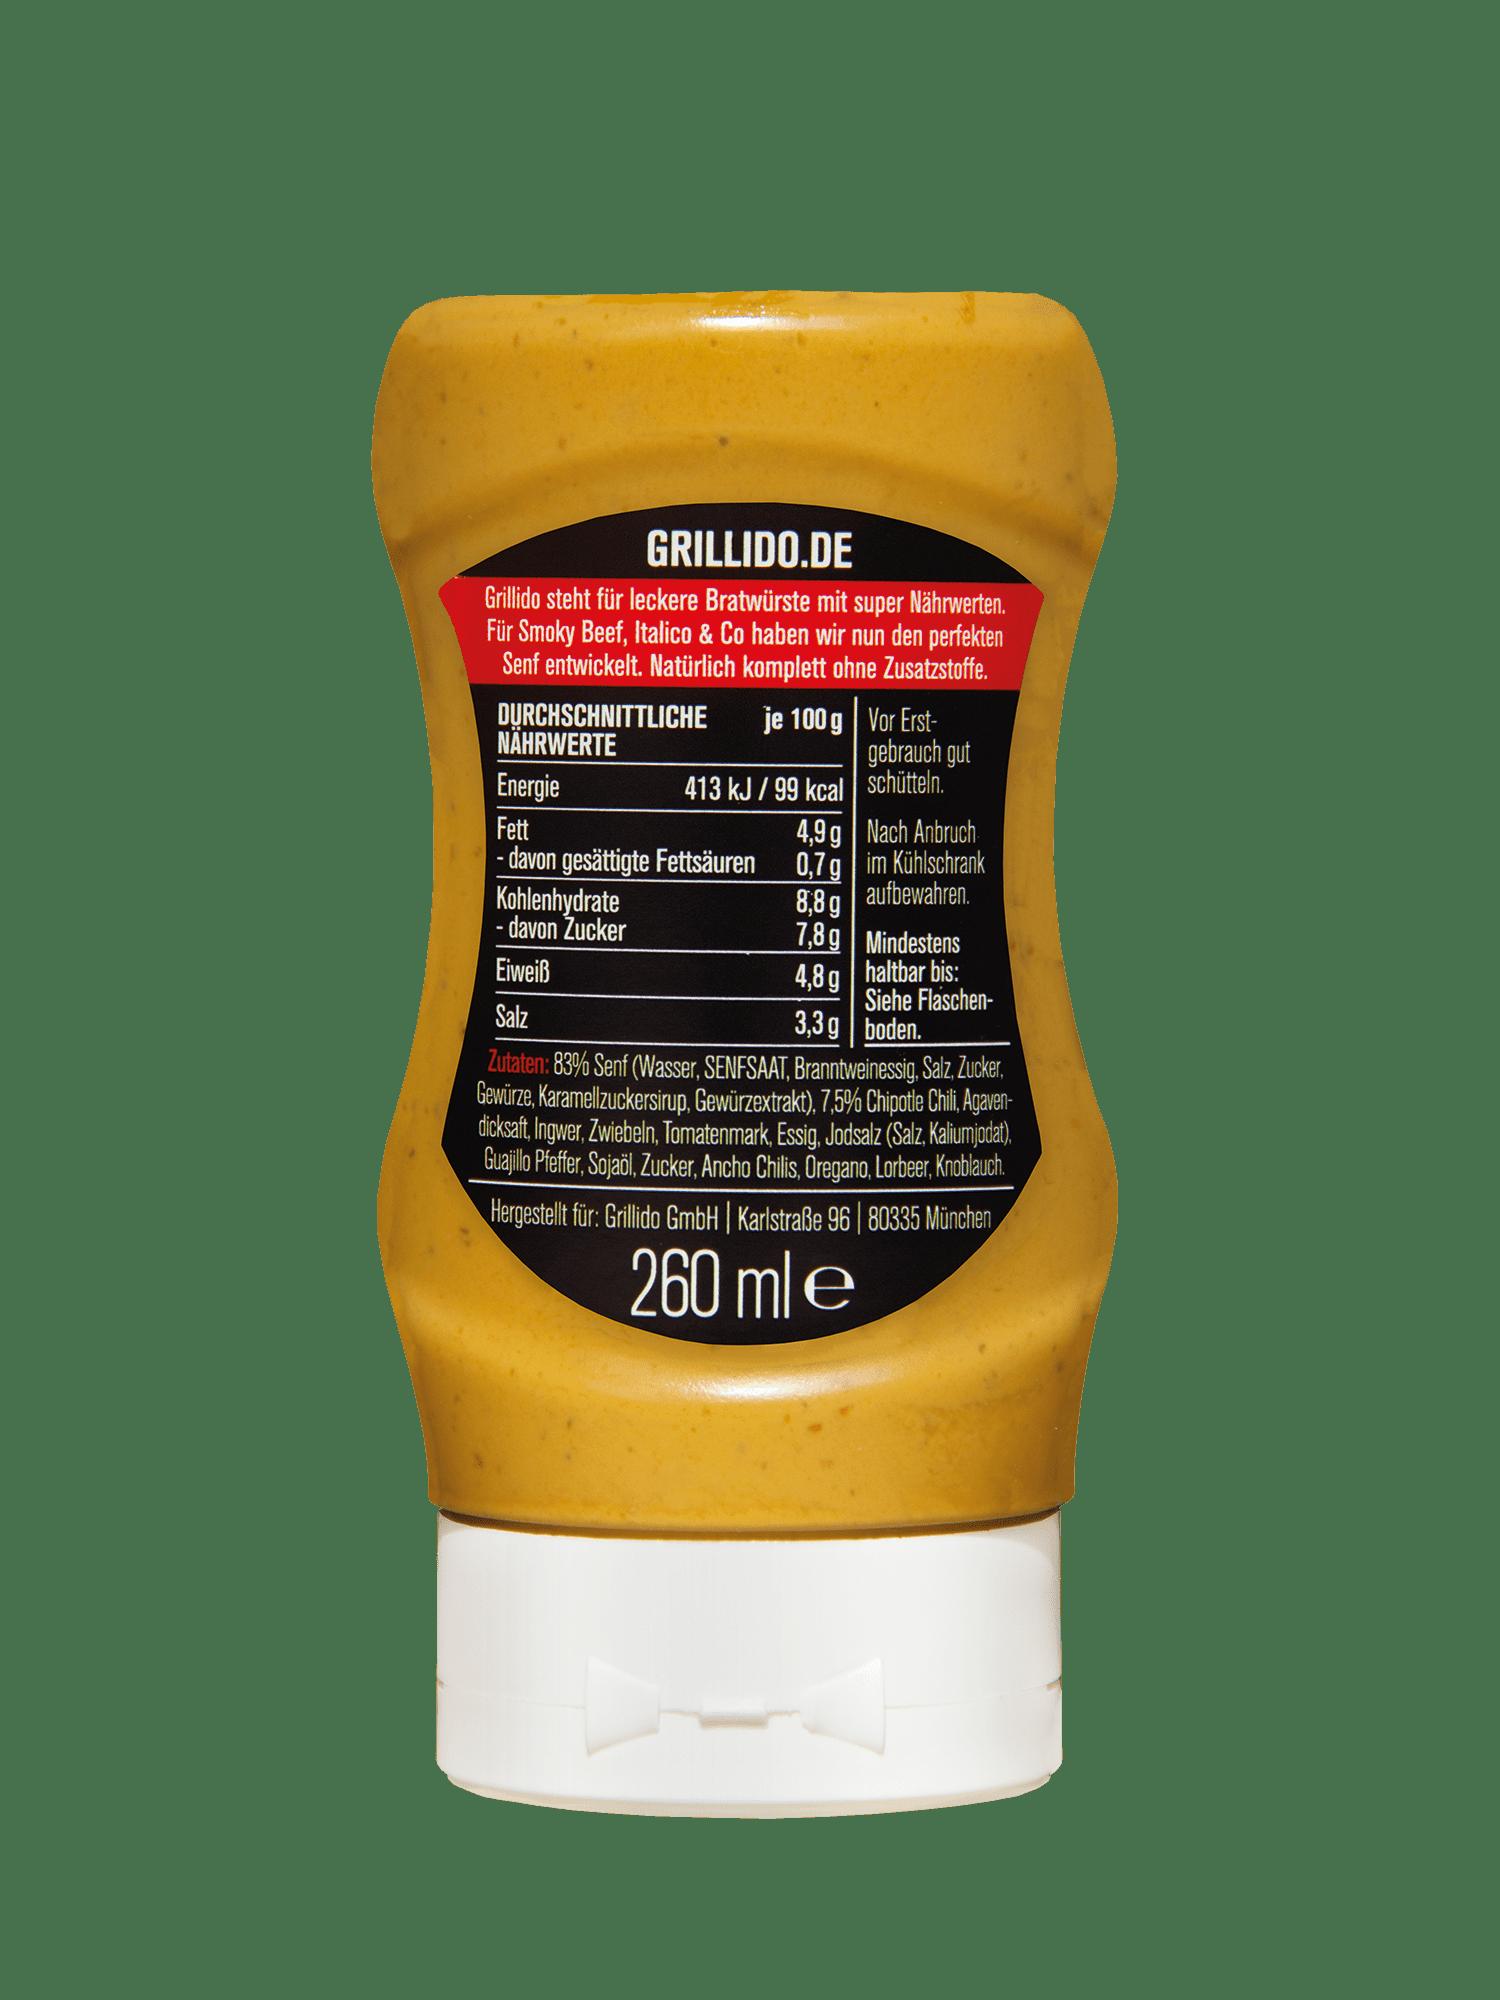 Grillido Chipotle Senf Verpackung Inhaltsstoffe